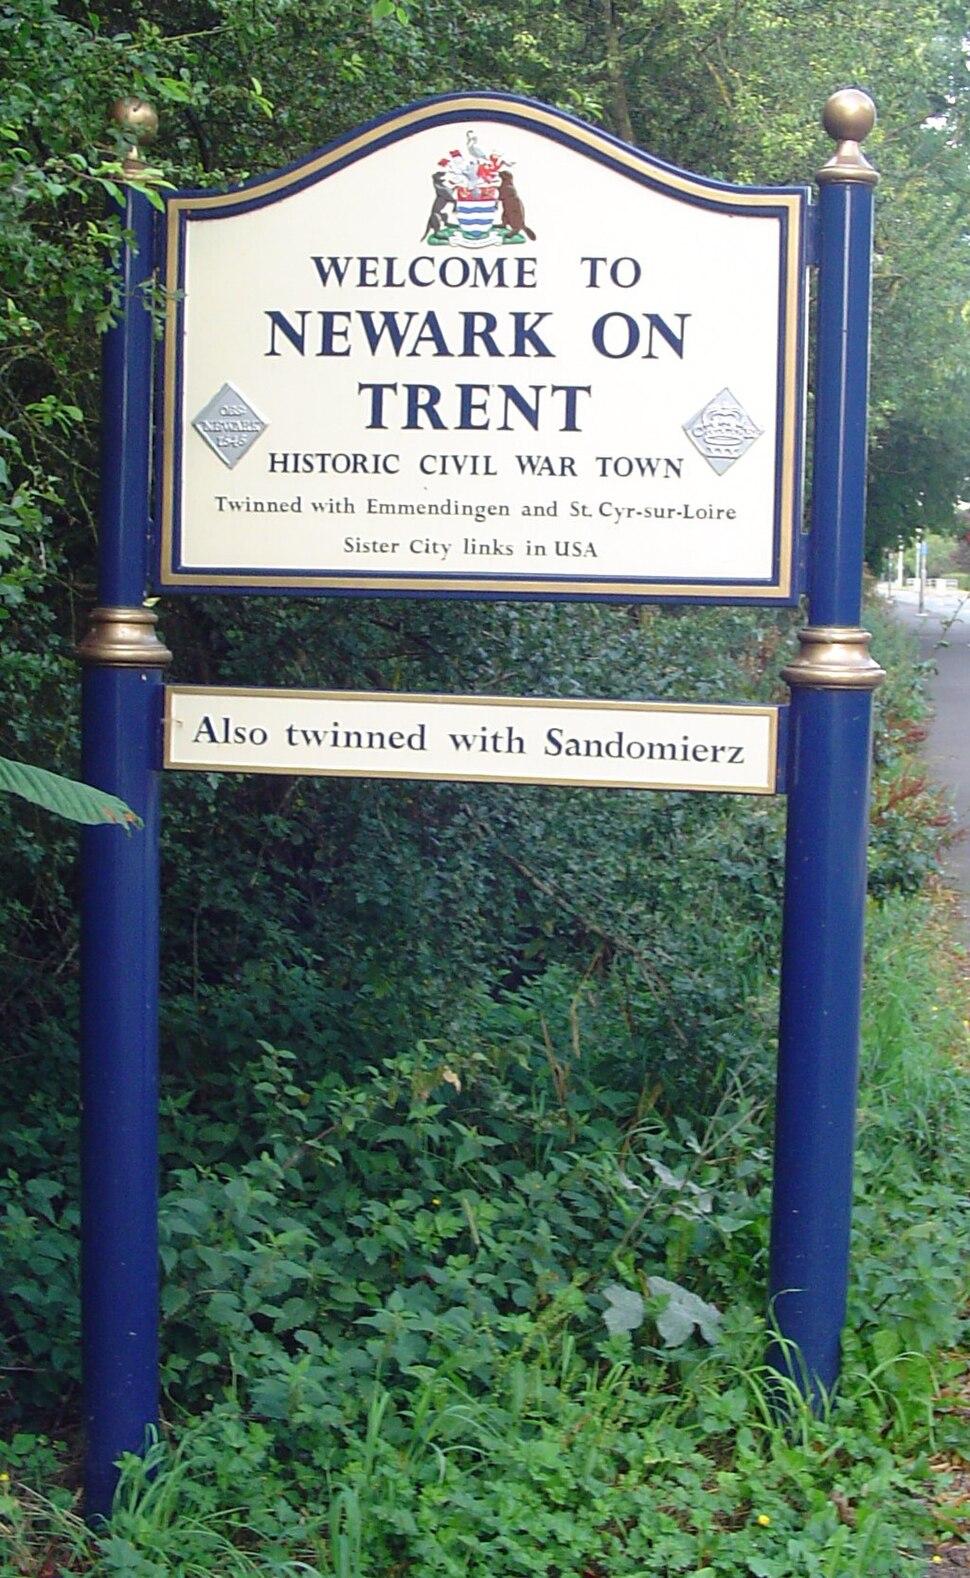 UK NewarkonTrent